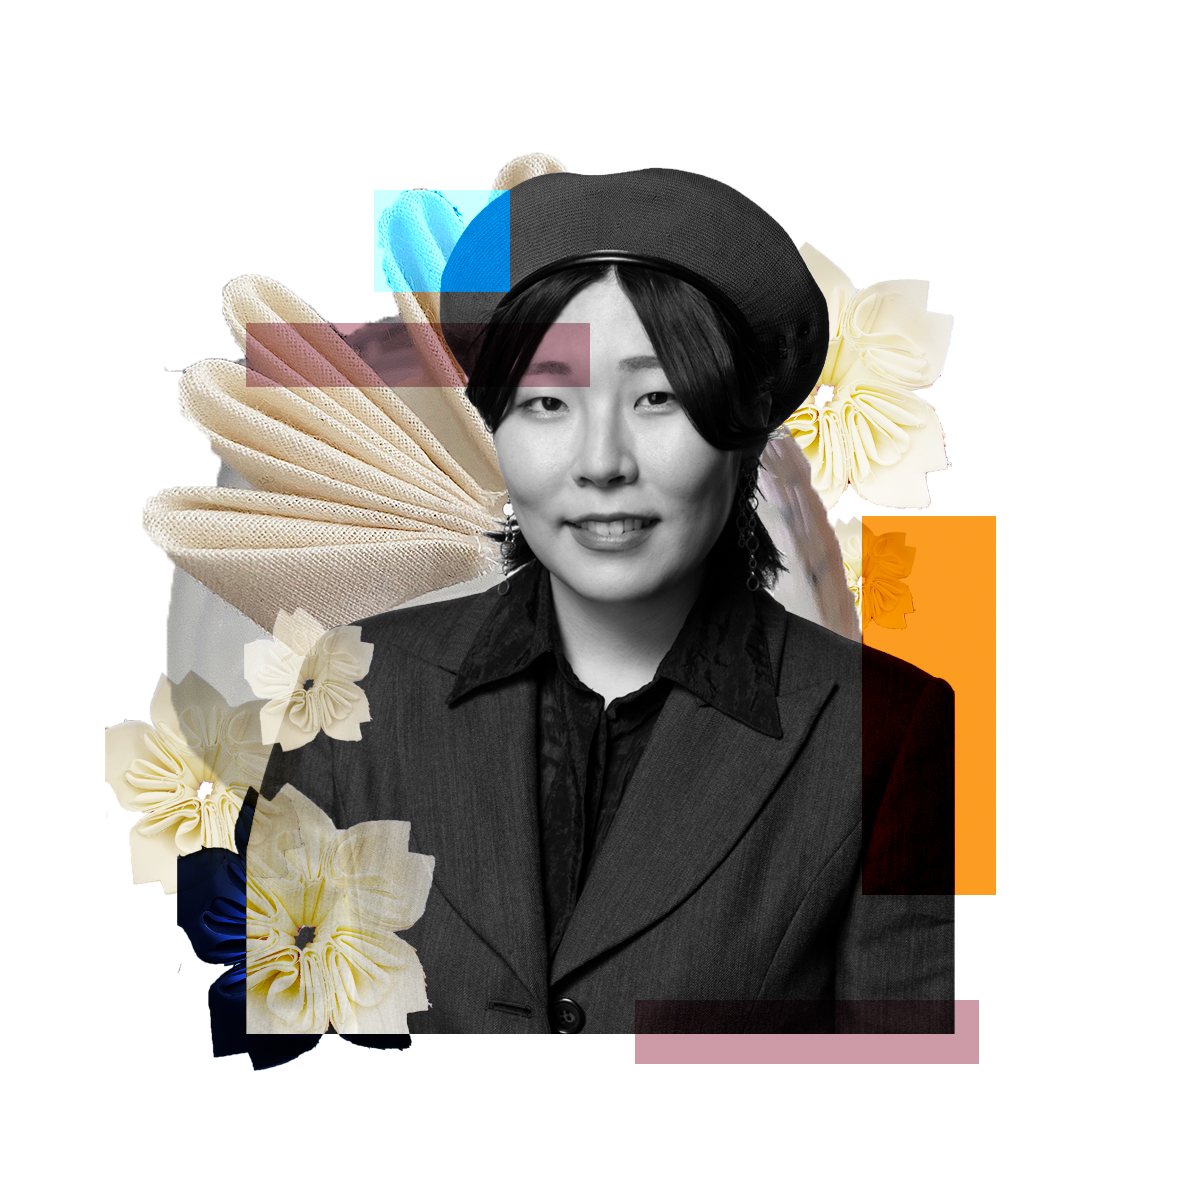 Sakura Mizutani - Fashion Institute of Design & Merchandising